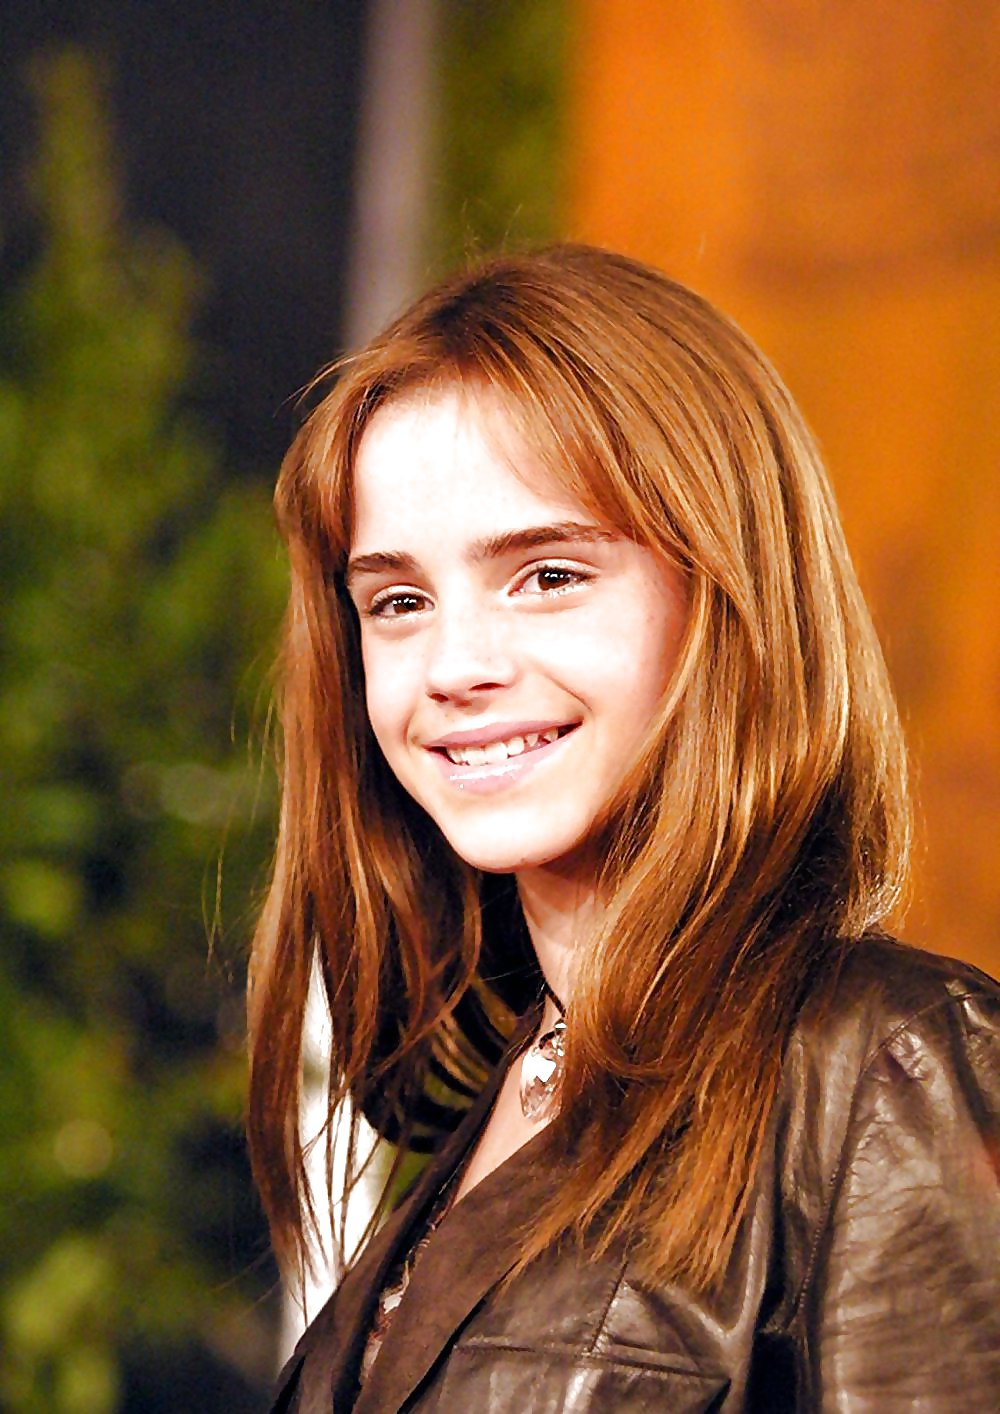 Teen Porn Galleries: Sexy Emma Watson